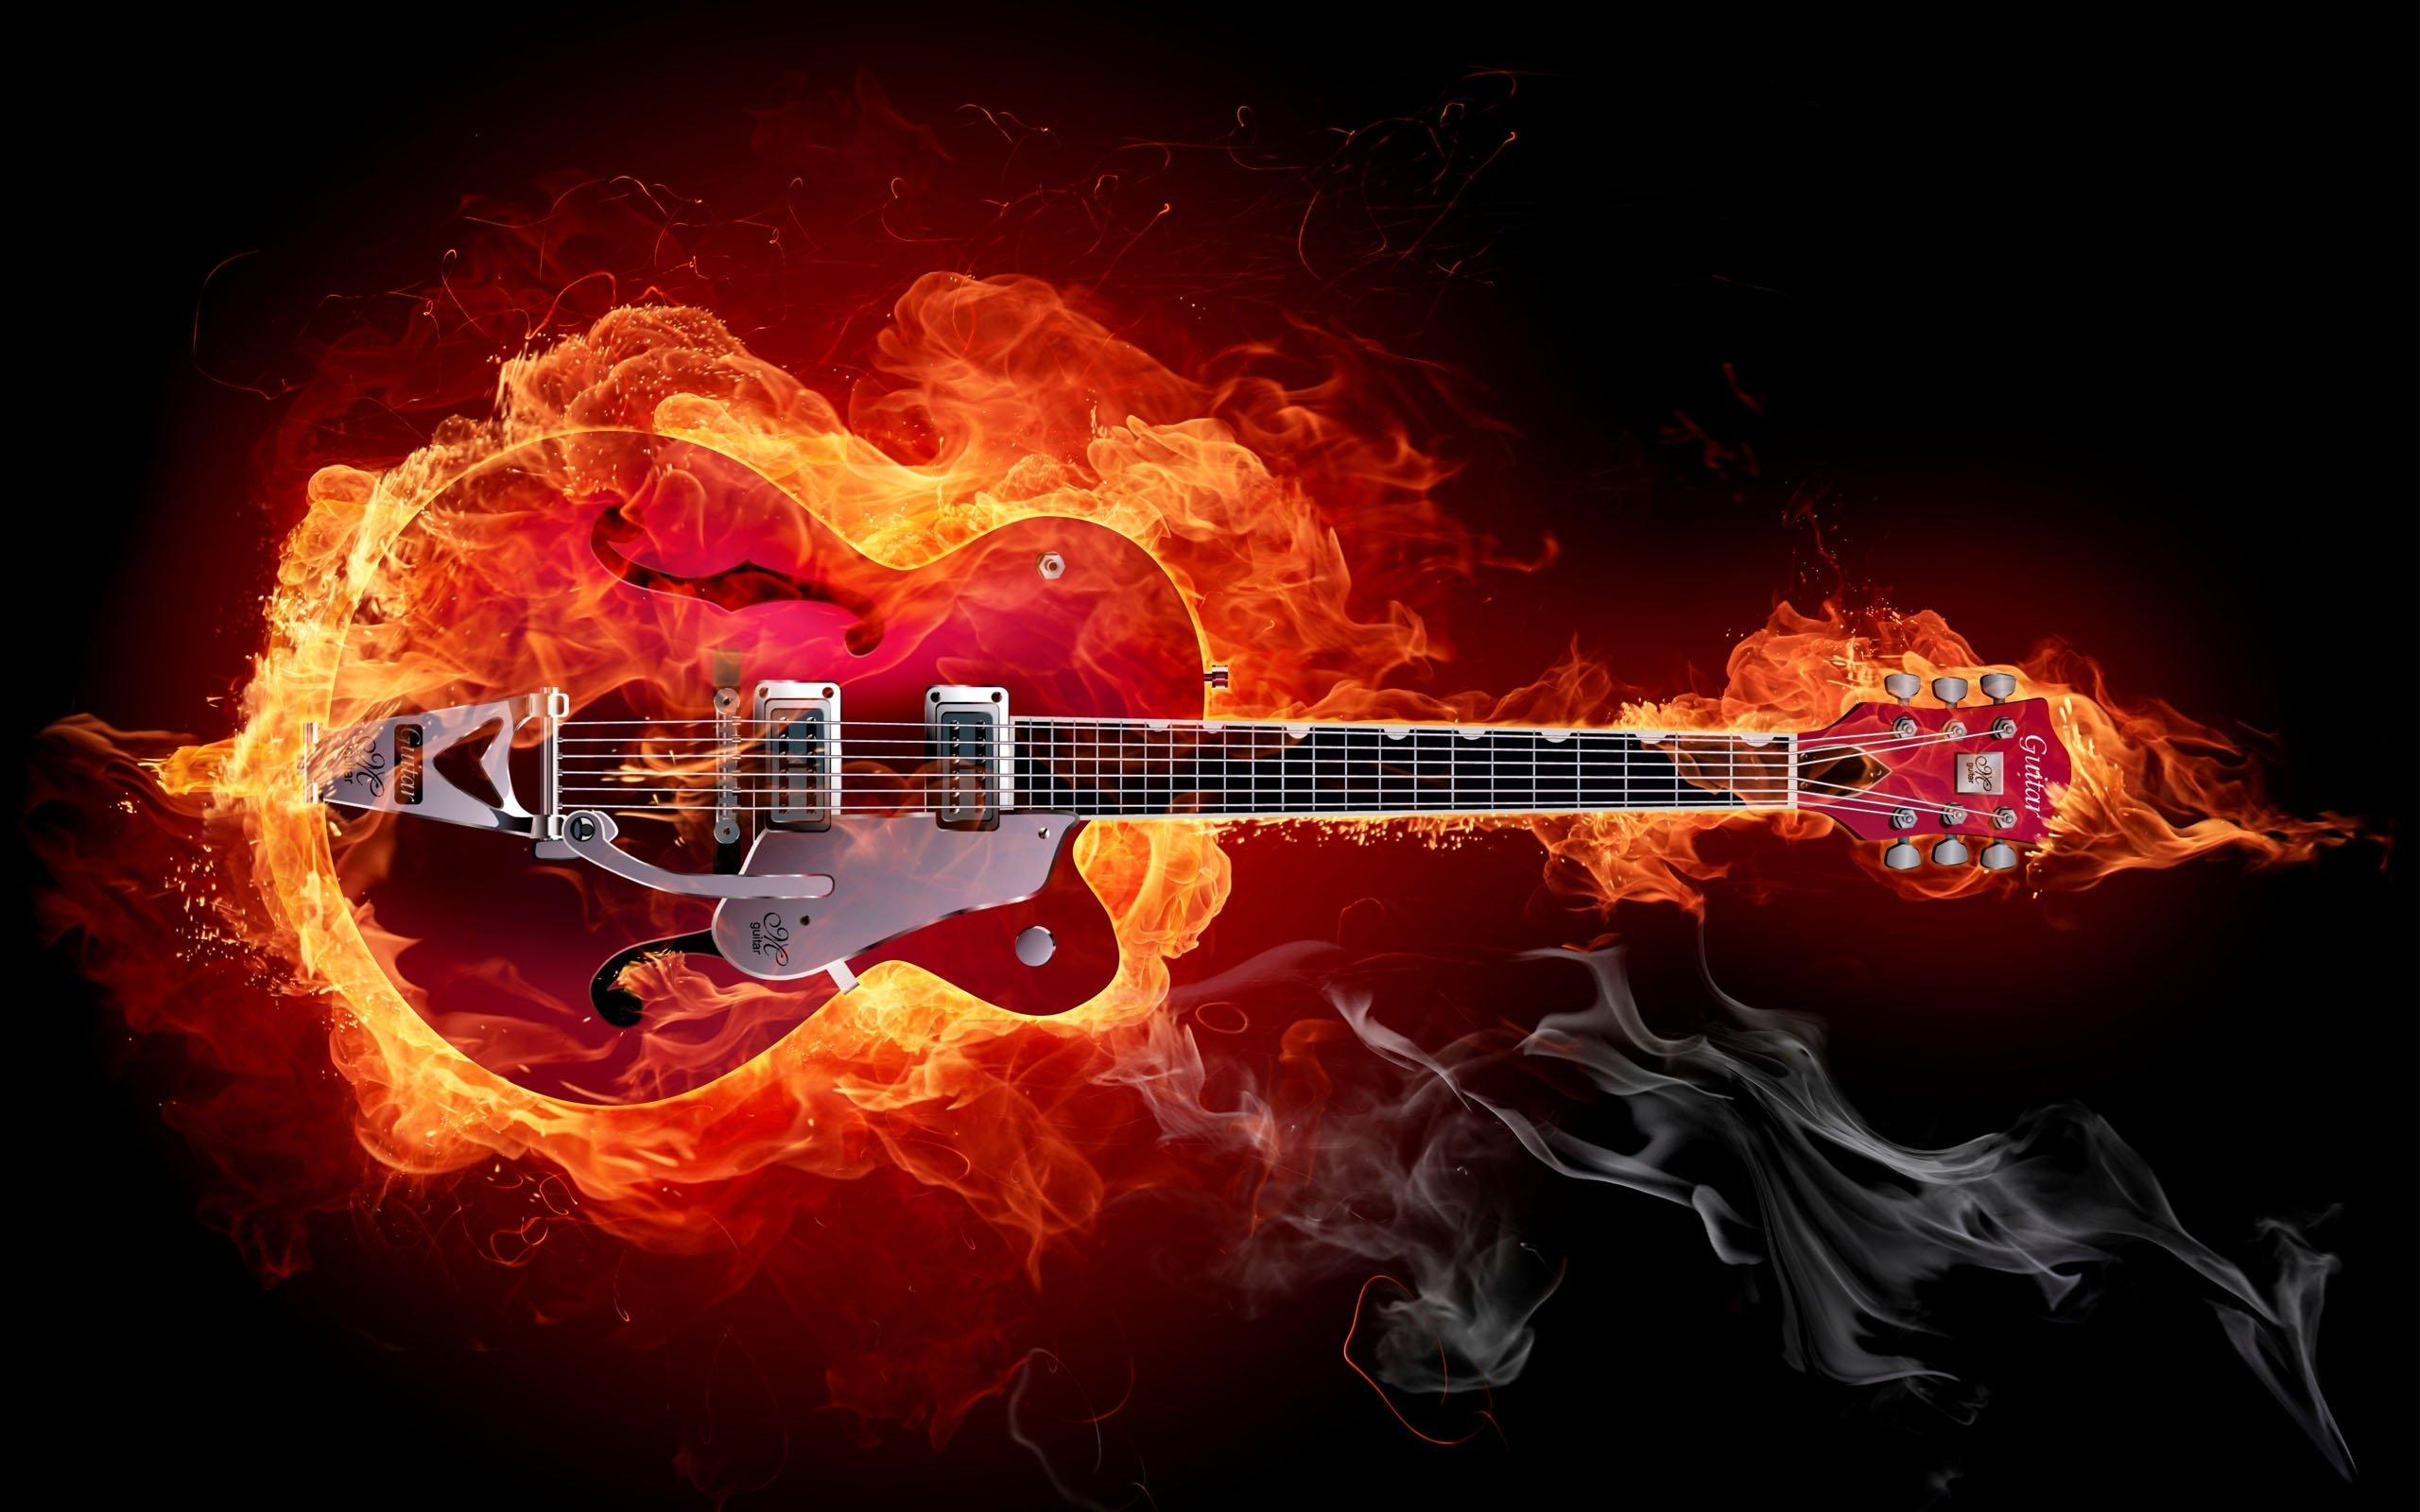 Fotos   Images Blue Music Neon Rock Guitar Wallpaper Wallchan 2560x1600